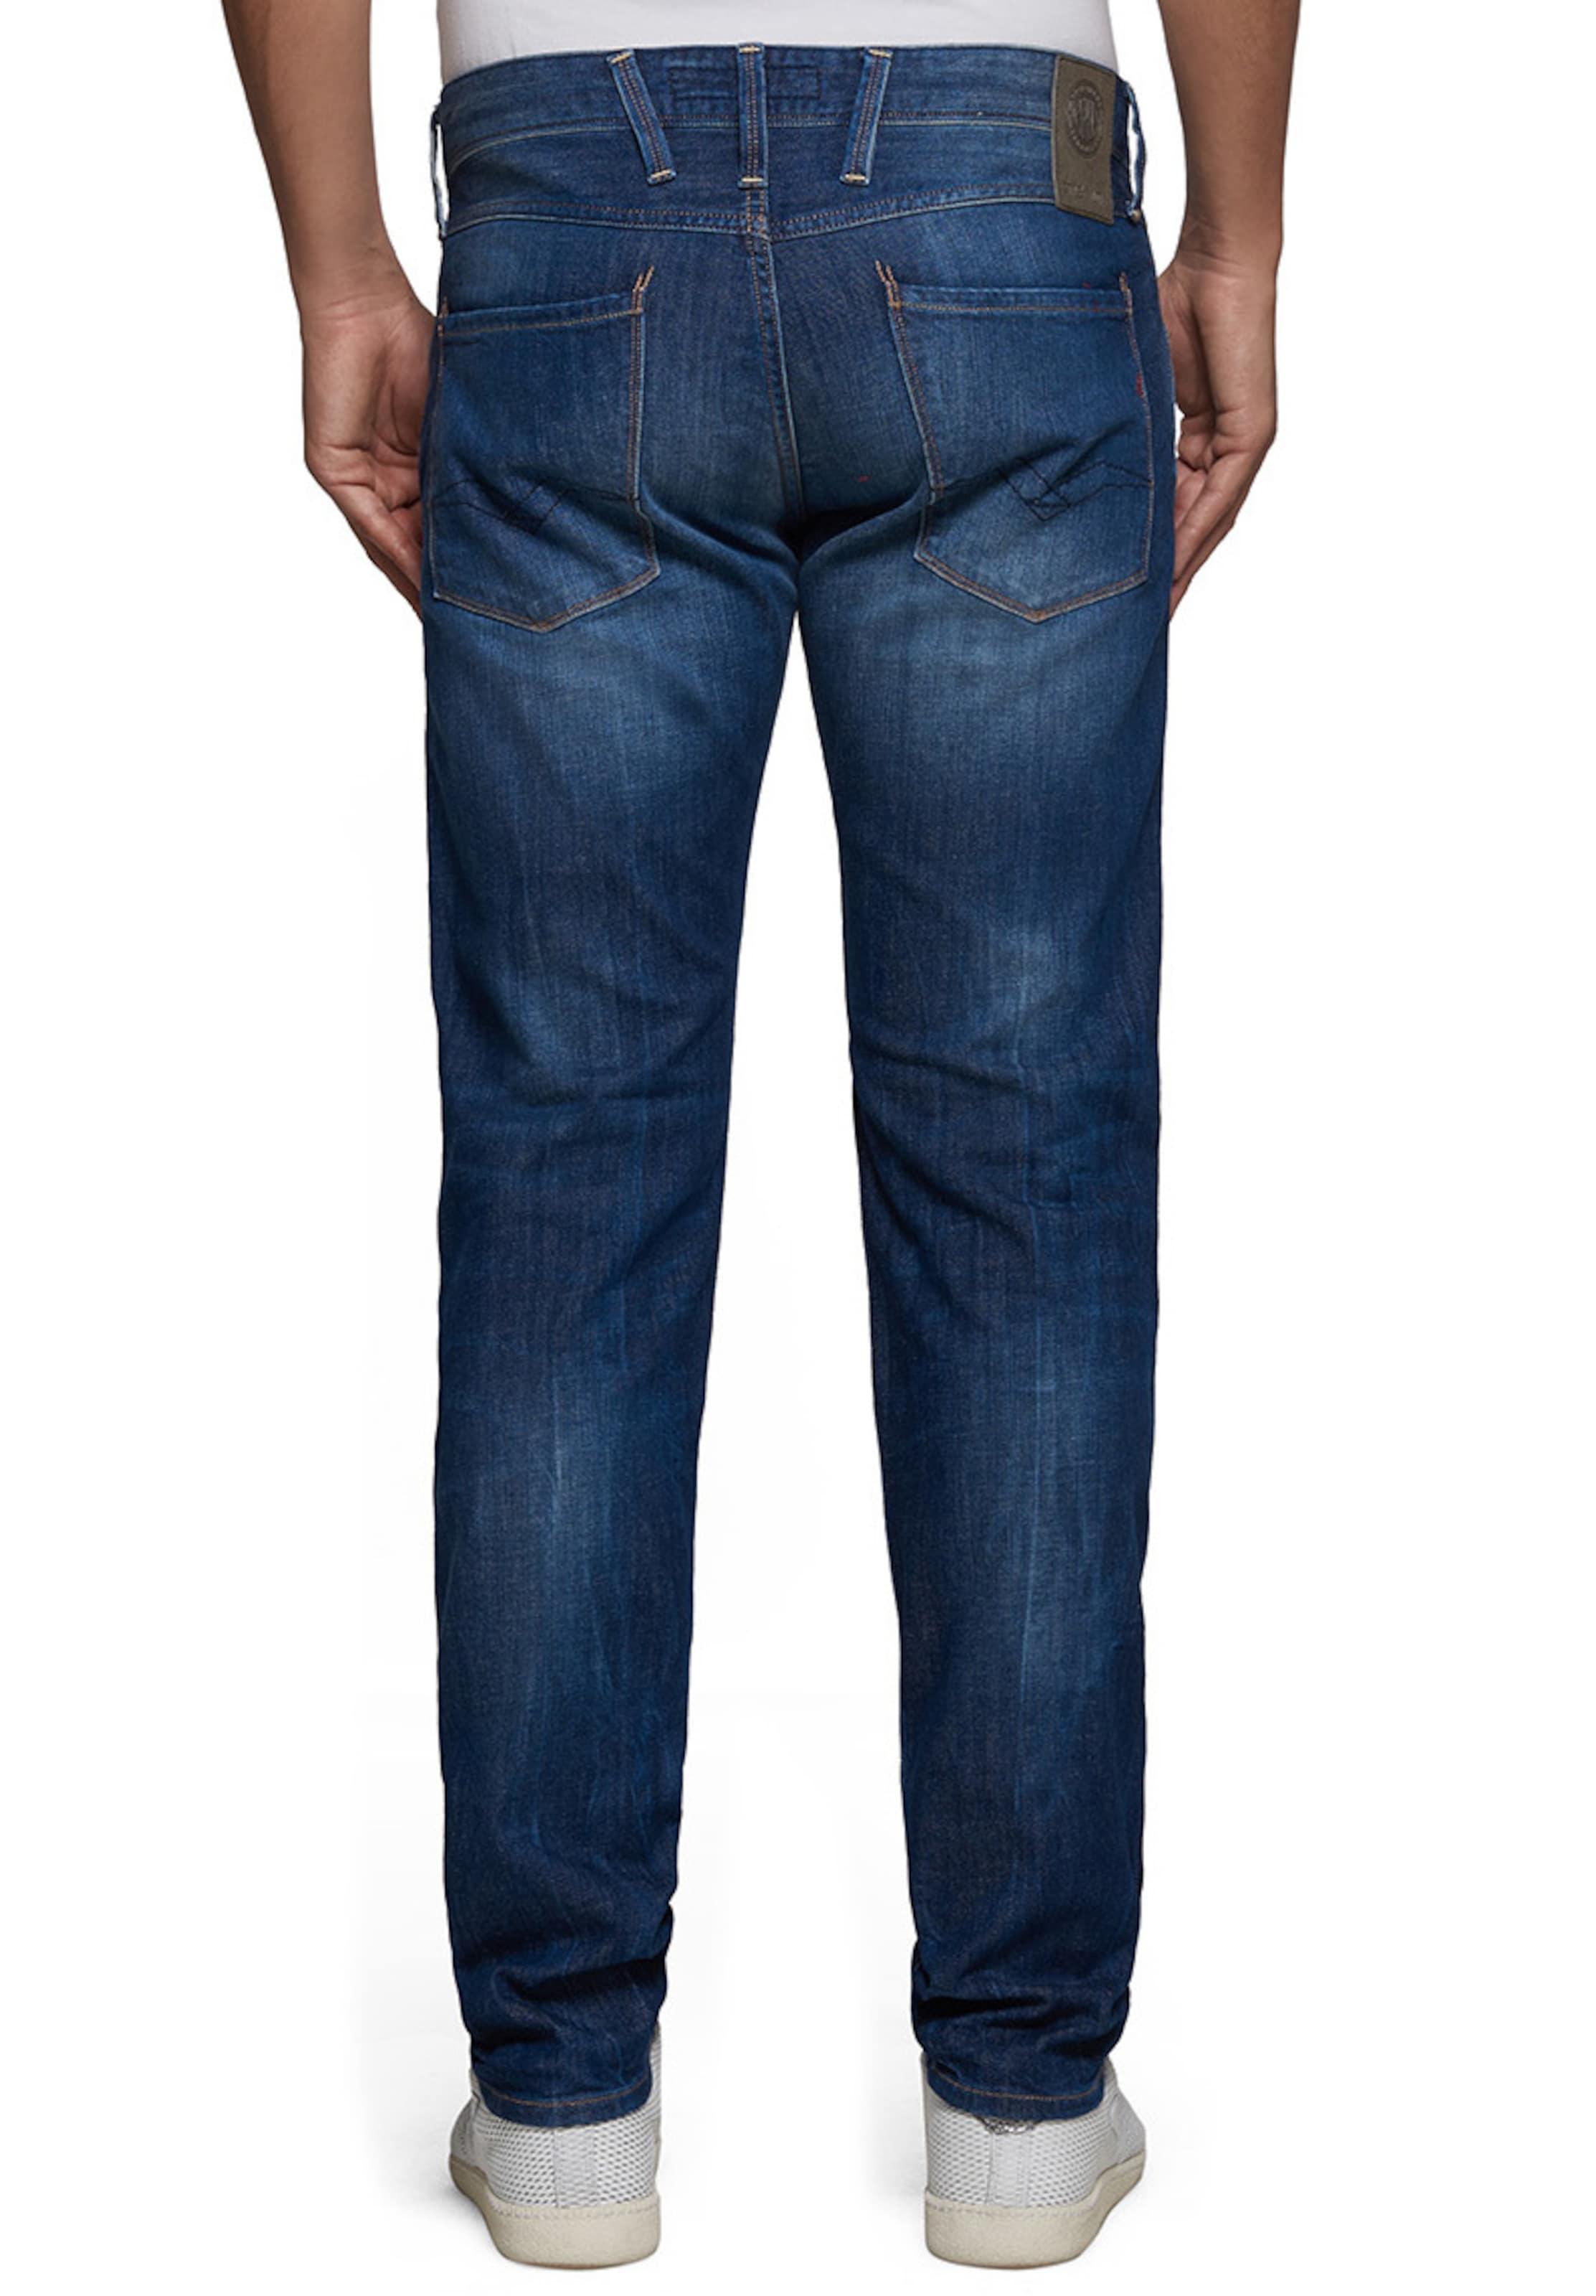 Professionelle Günstig Online REPLAY Jeans ANBASS COMFORT DENIM Niedriger Preis Online Billig Günstig Online Rabatt Browse Perfekte Online DPPBVXHS